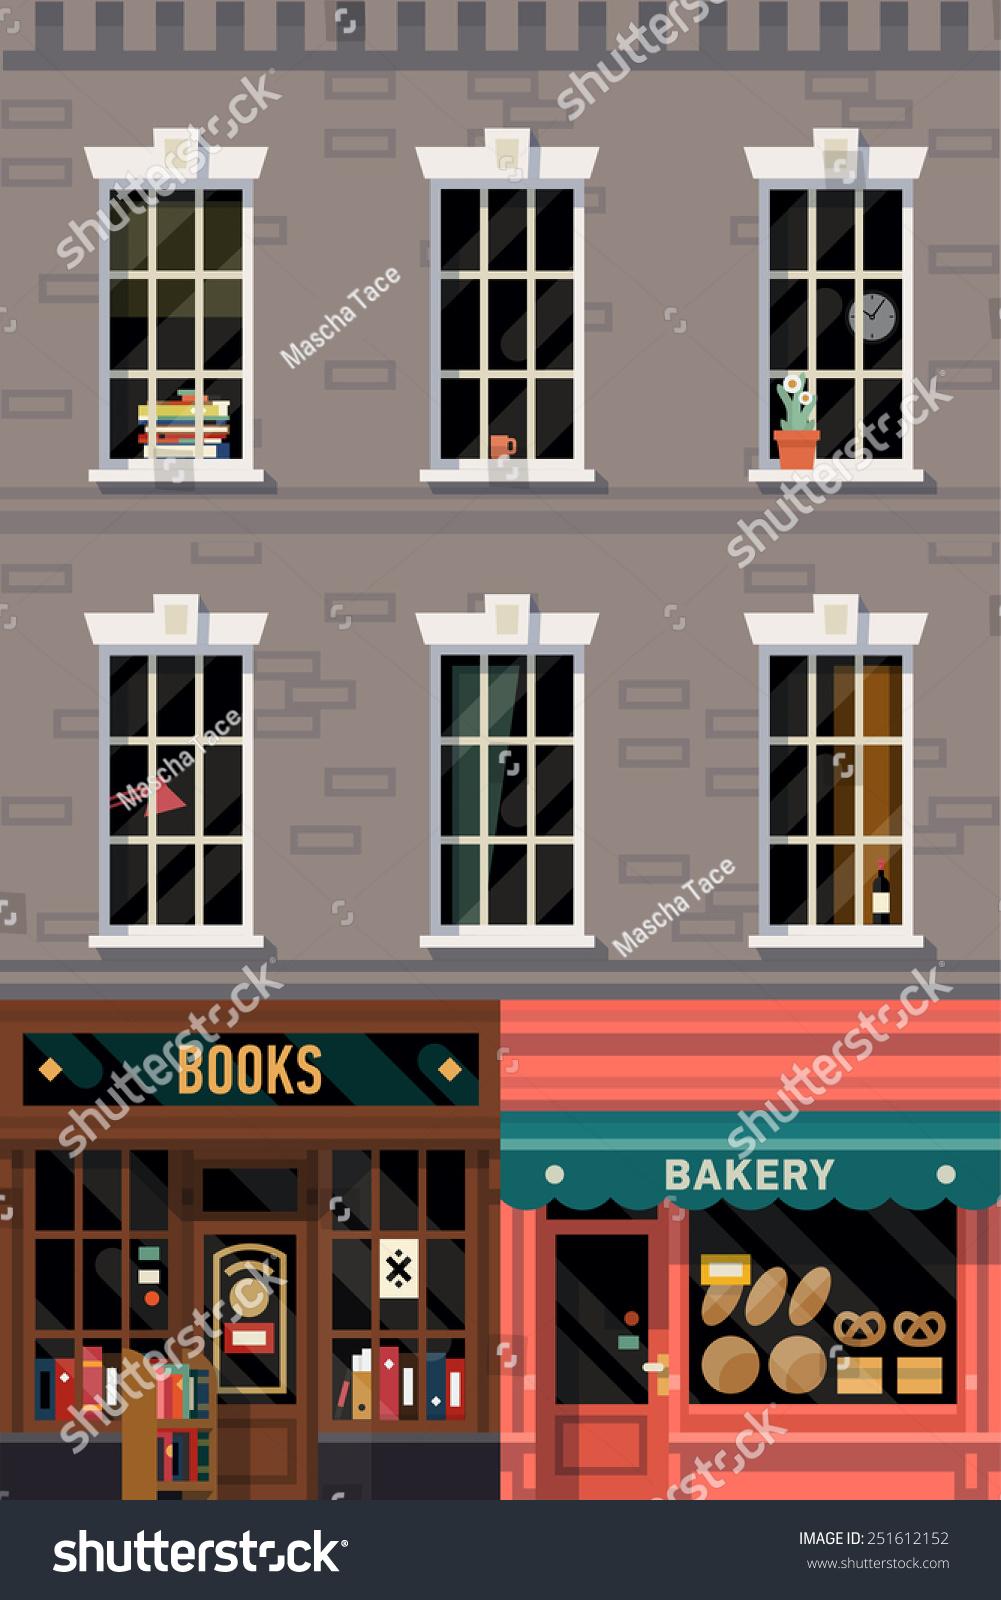 Vector Retro Printable Poster Design Background On Downtown Grey Brick Building Structure Facade